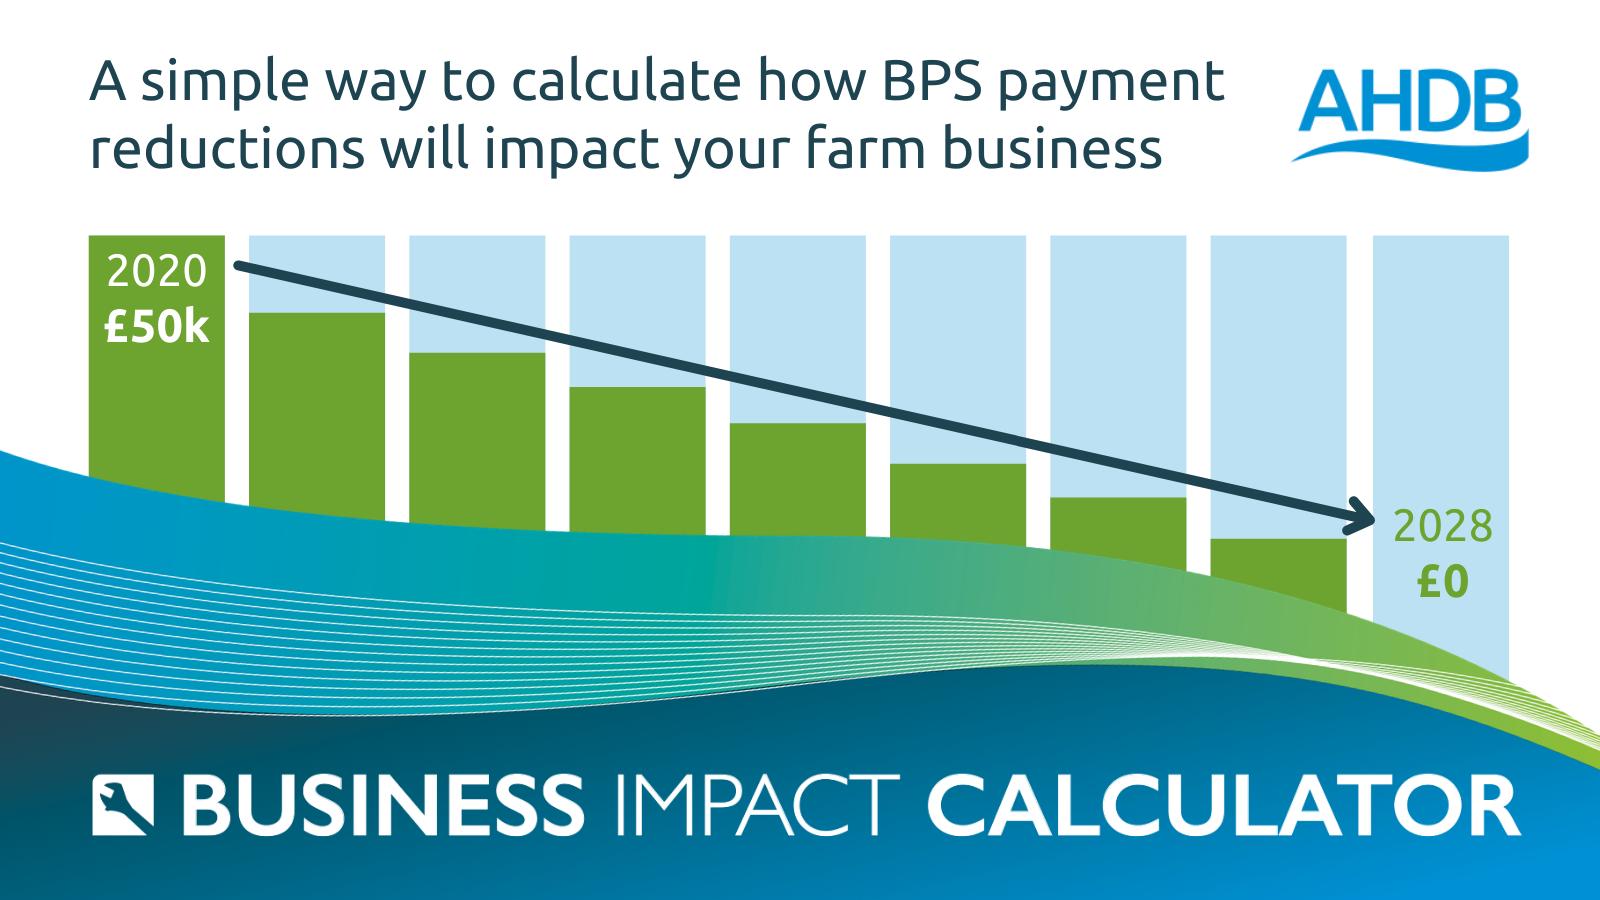 Business Impact Calculator